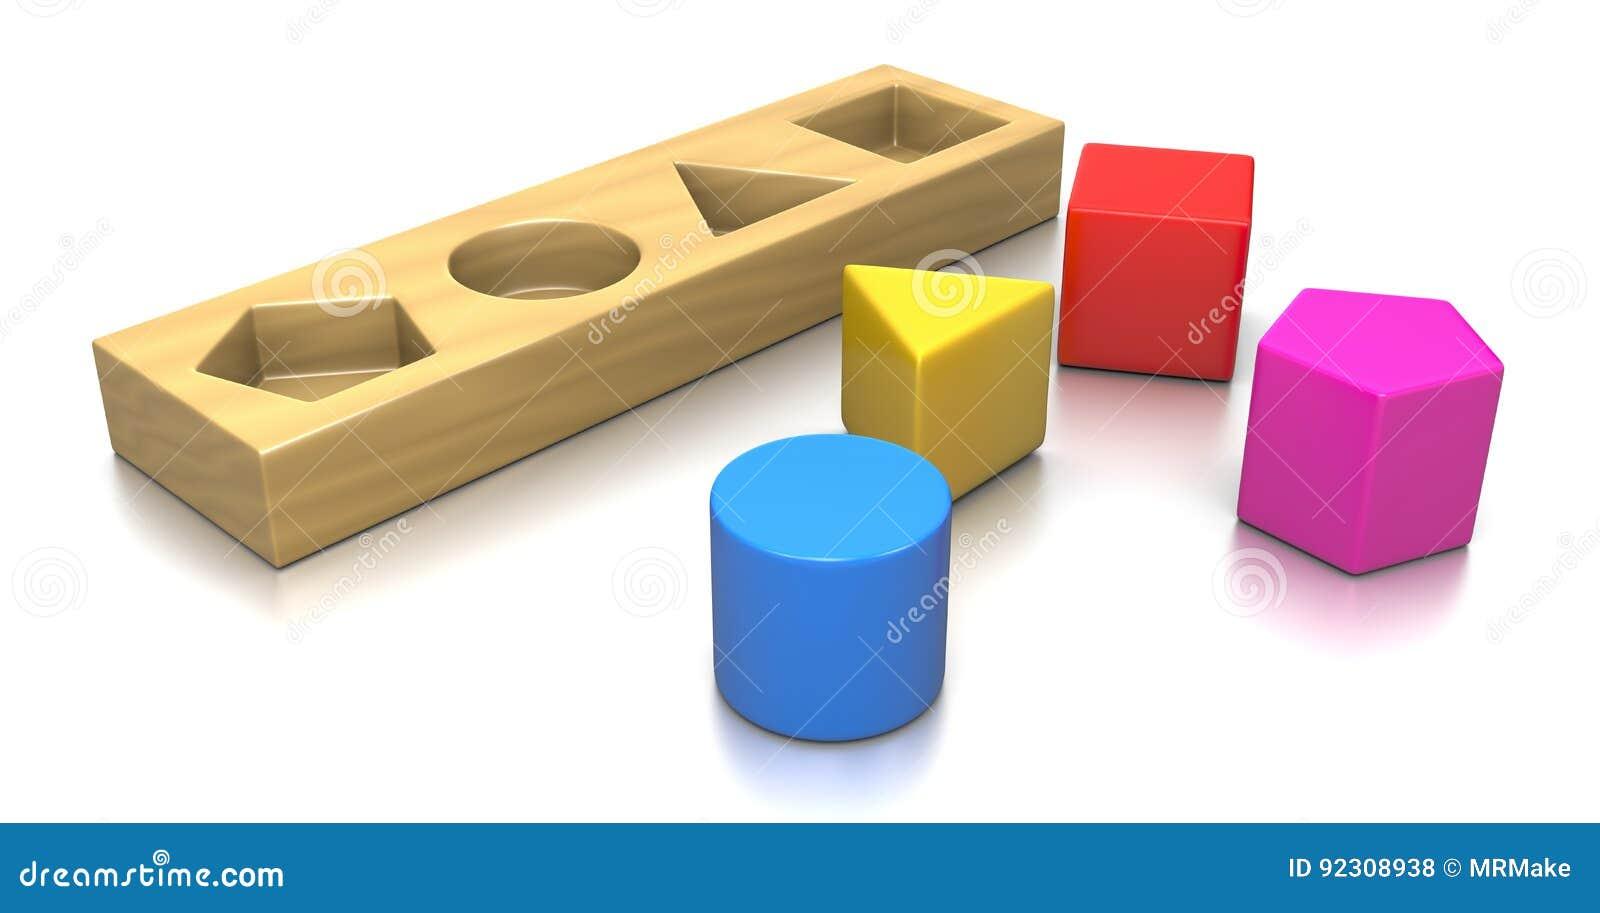 geometric problem solving